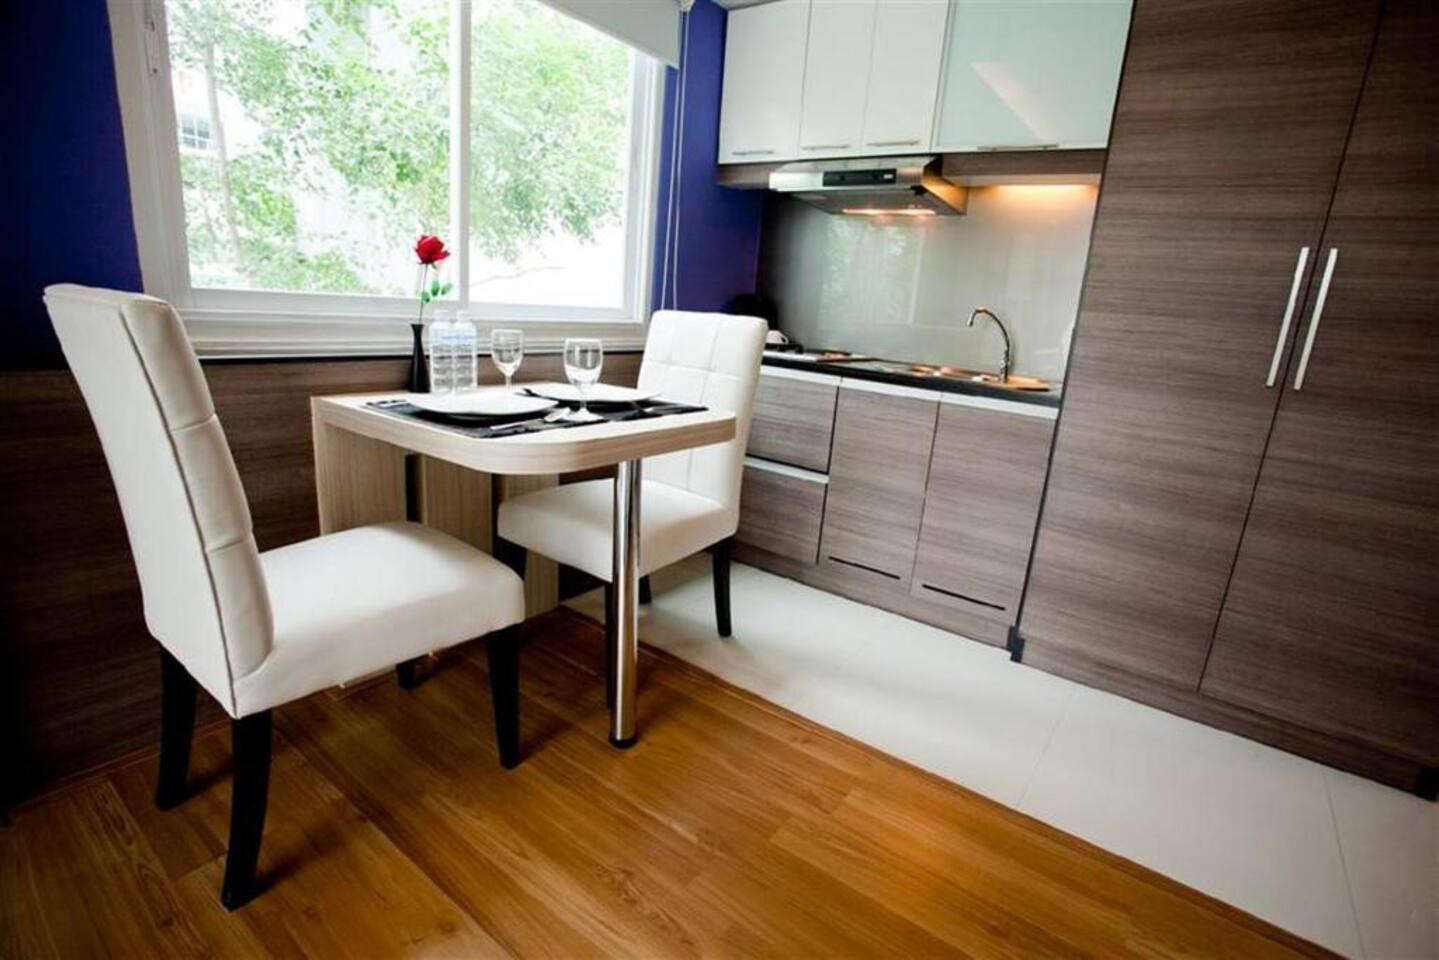 Studio Apartment Near Asoke BTS Skytrain